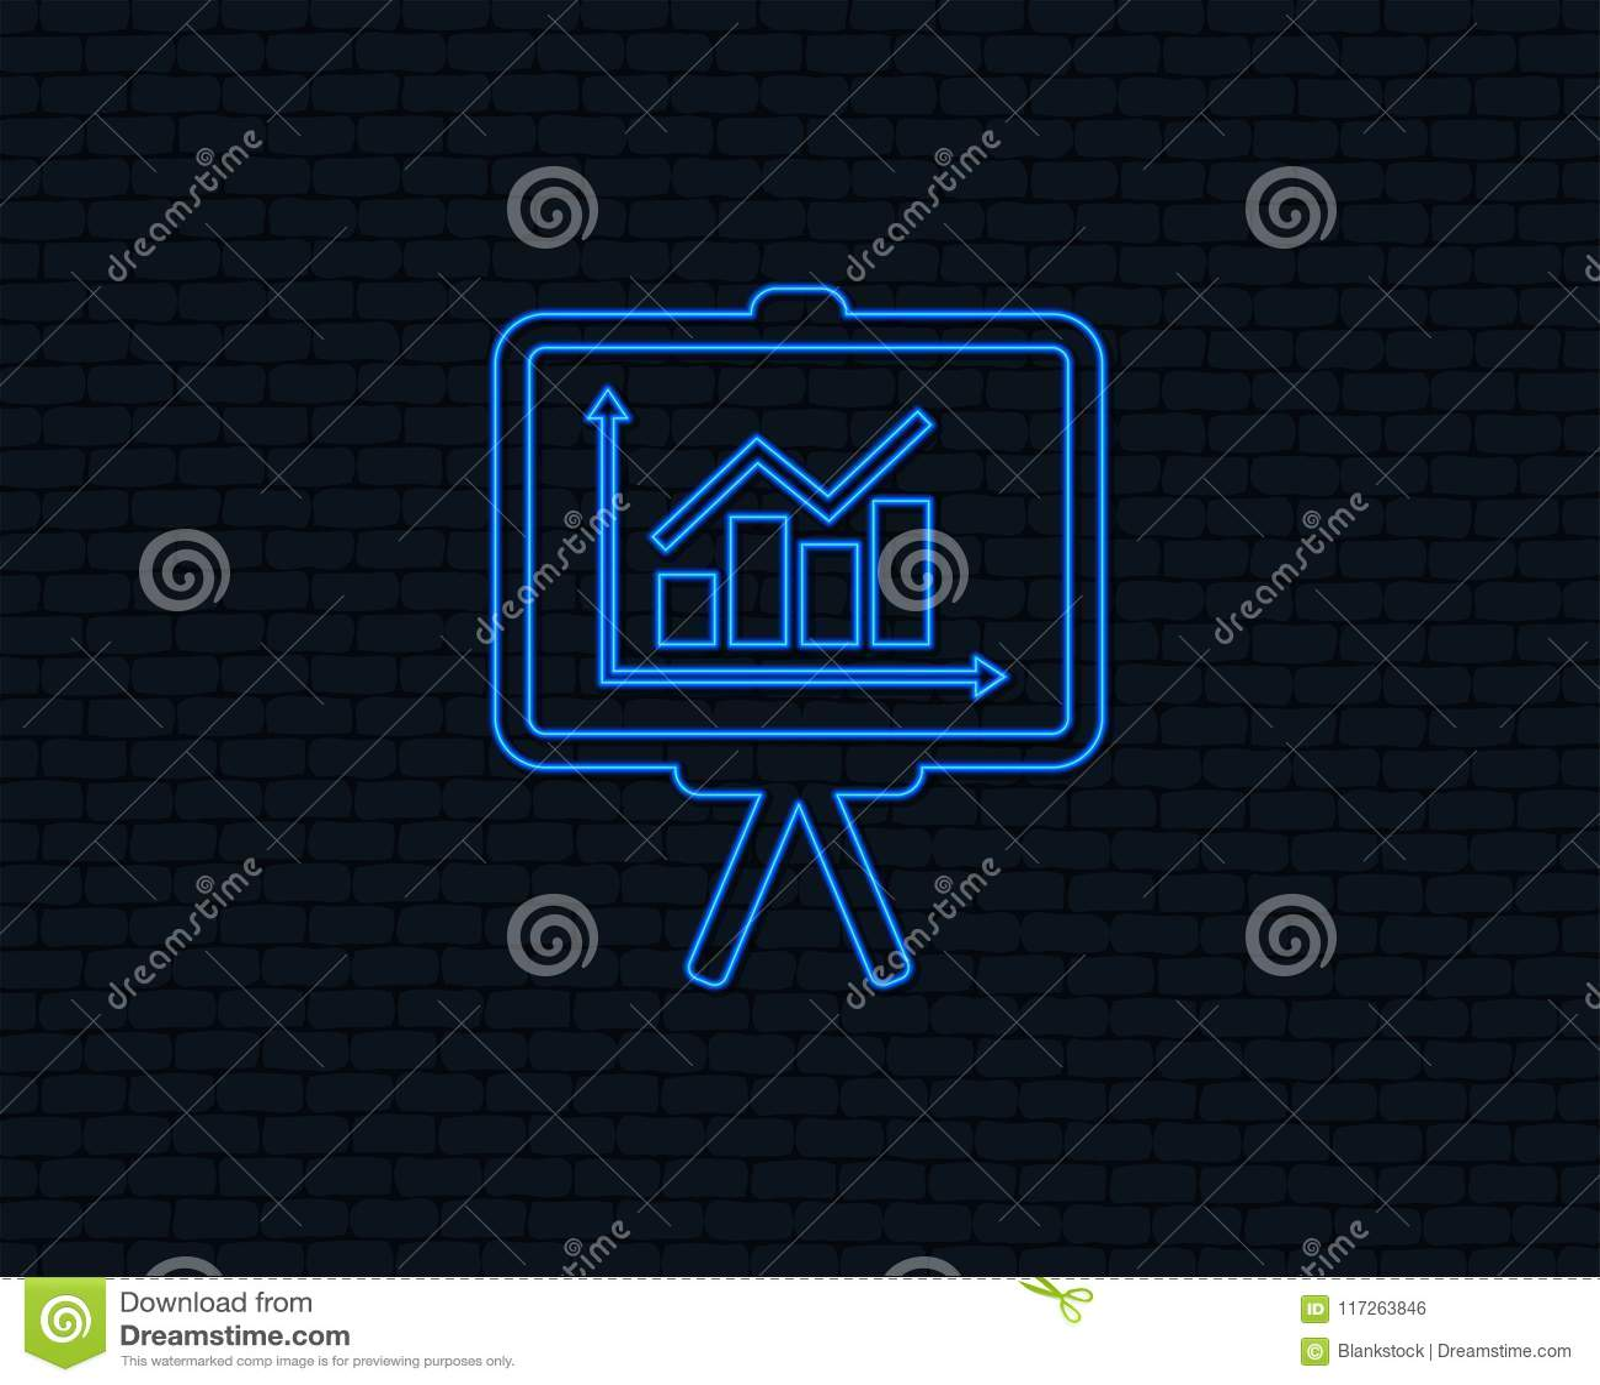 hight resolution of presentation billboard sign icon diagram symbol